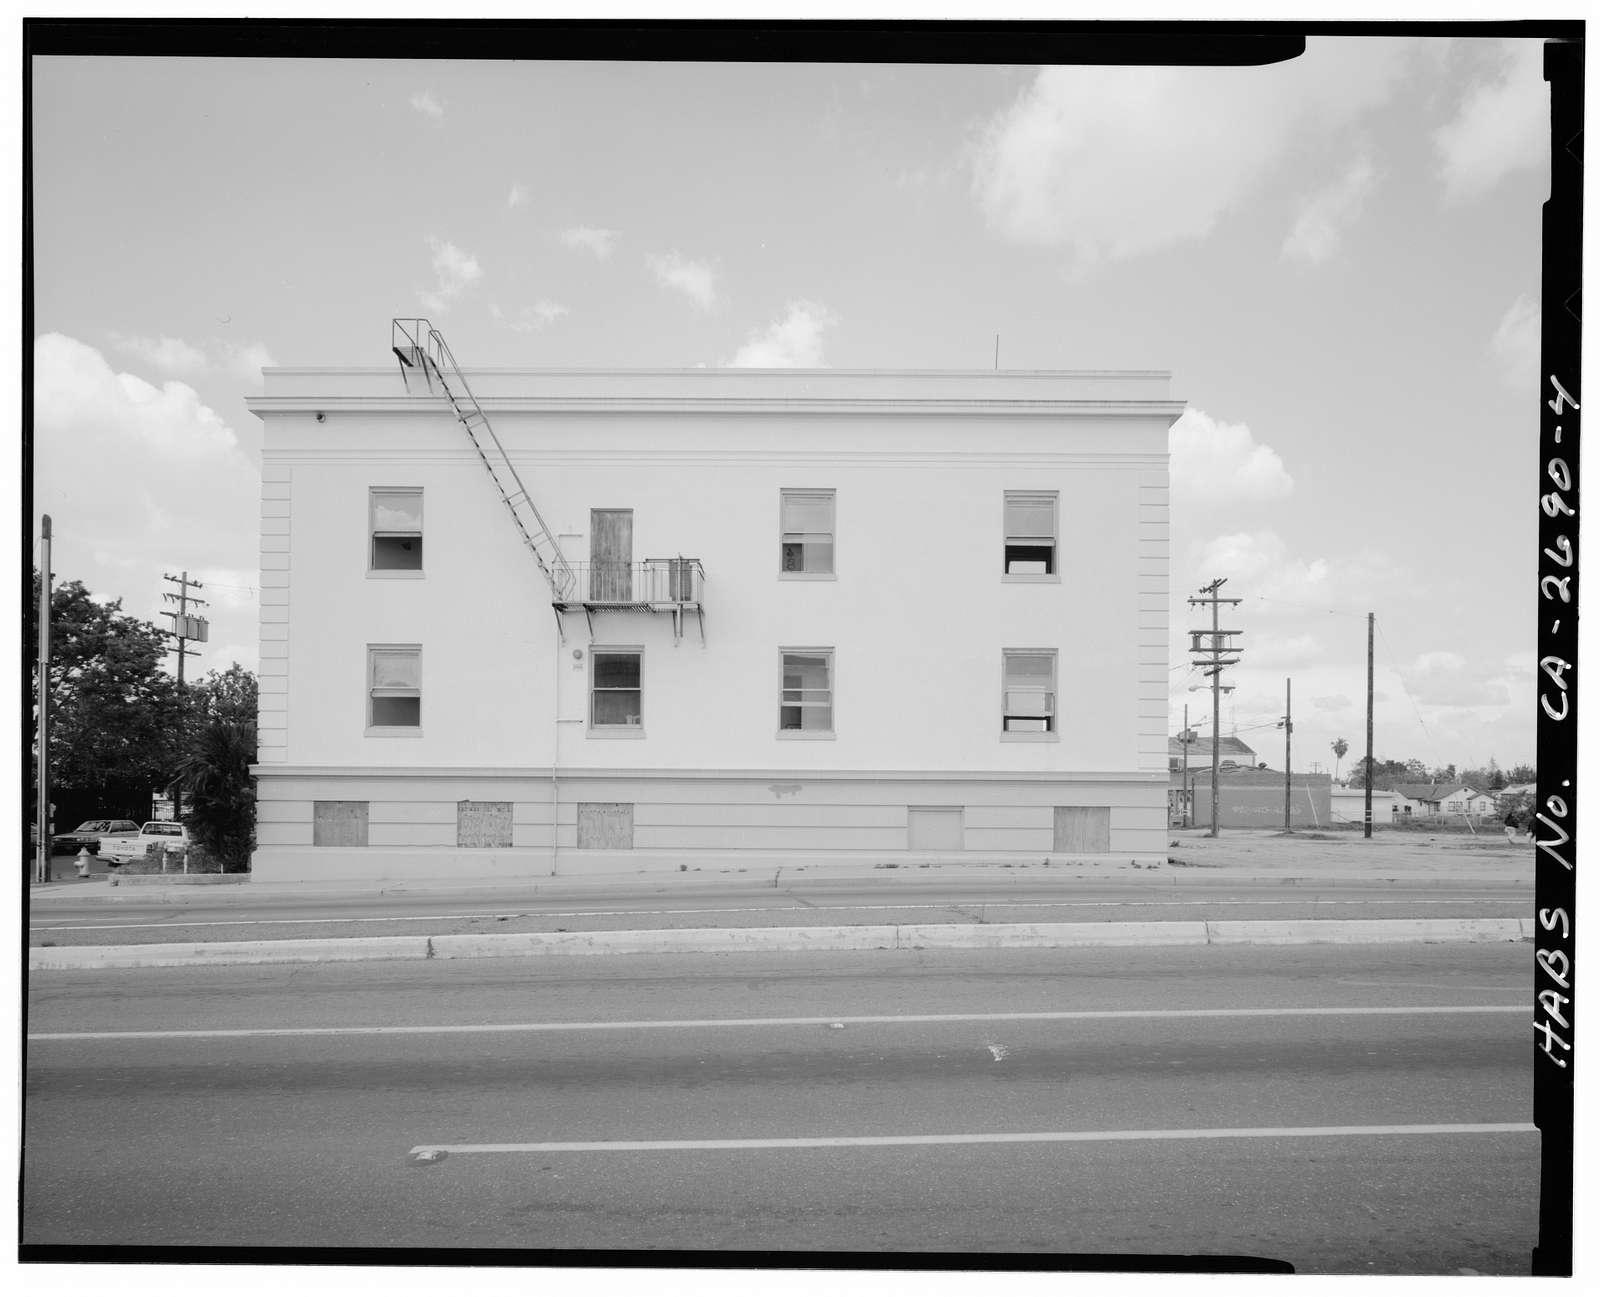 Burnett Nurse's Home, 120 North Howard Street, Fresno, Fresno County, CA